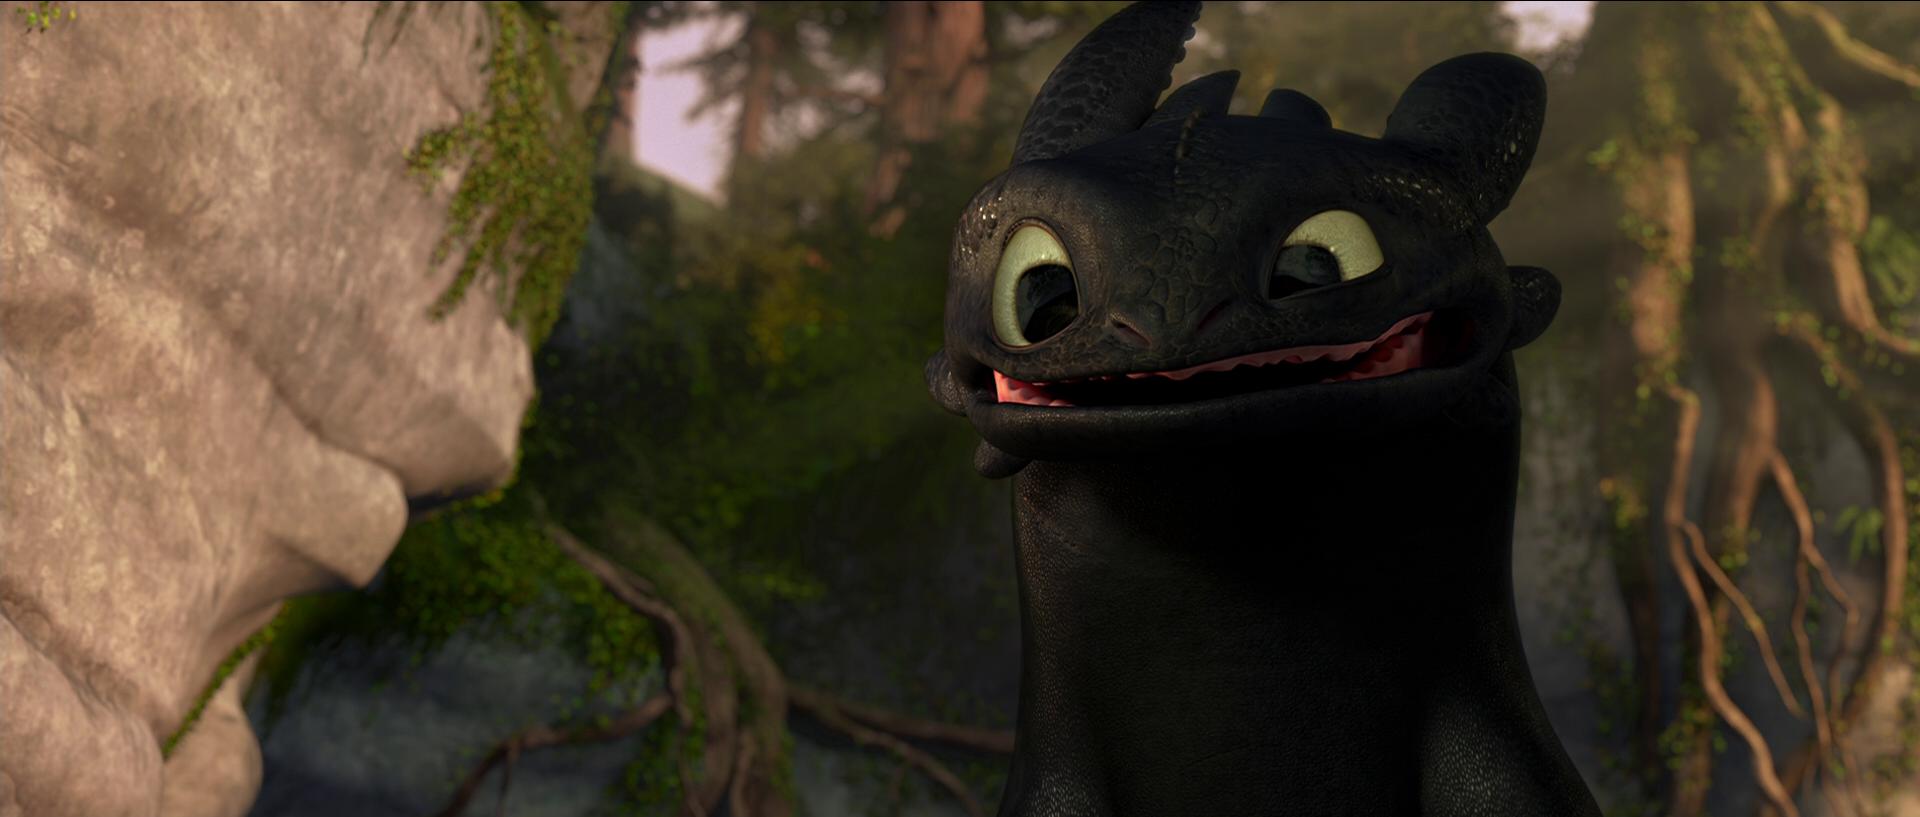 Toothless tries to smi...